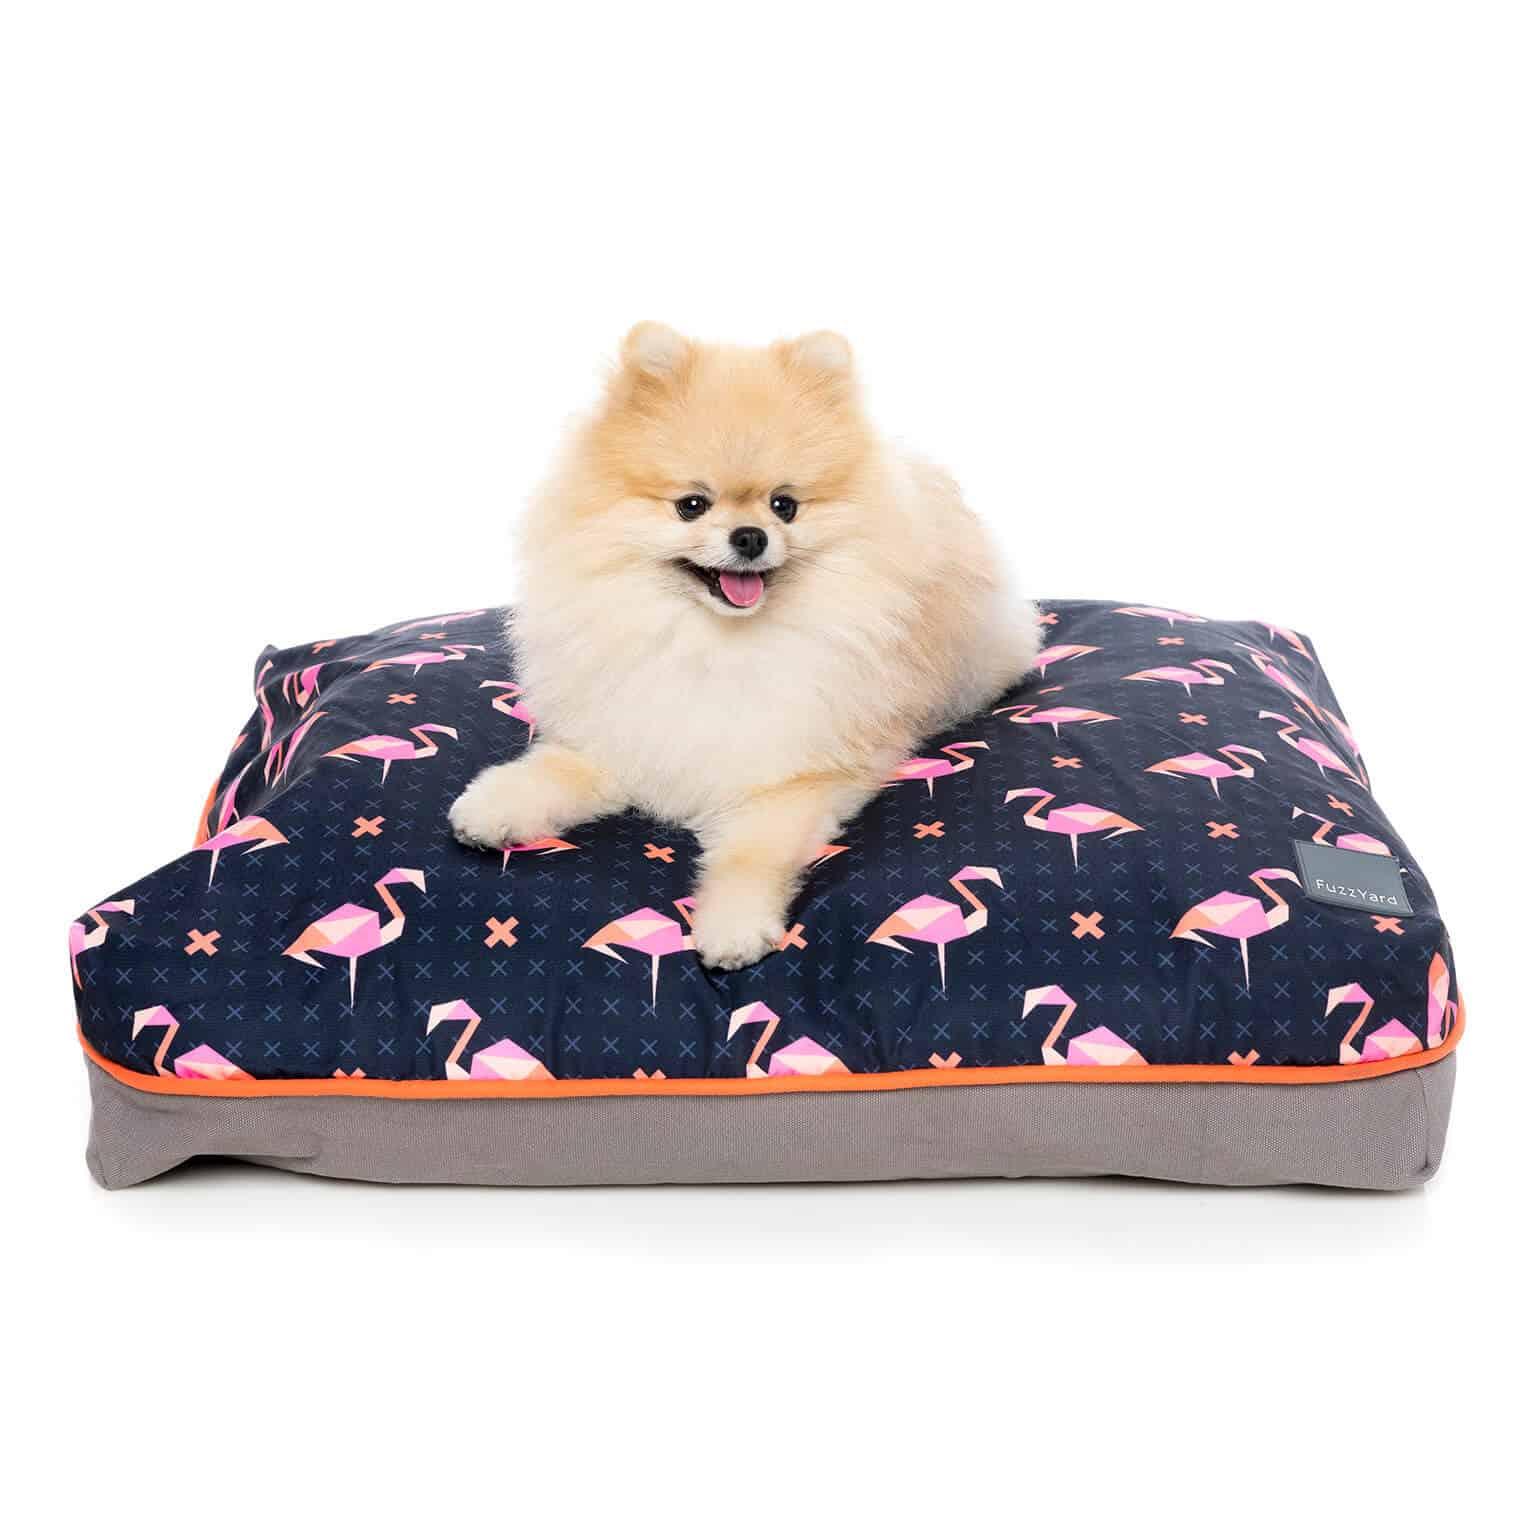 Fuzzyard Pillow Bed - Fabmingo